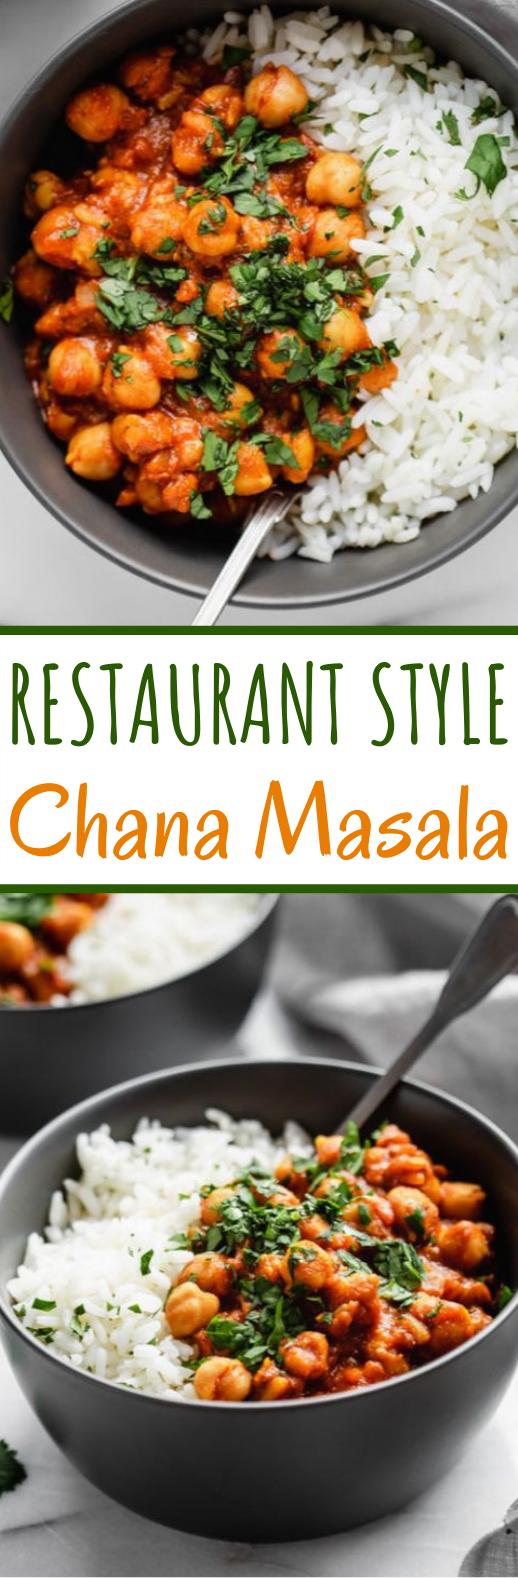 Restaurant Style Chana Masala #vegan #dinner #meatless #curry #chickpea